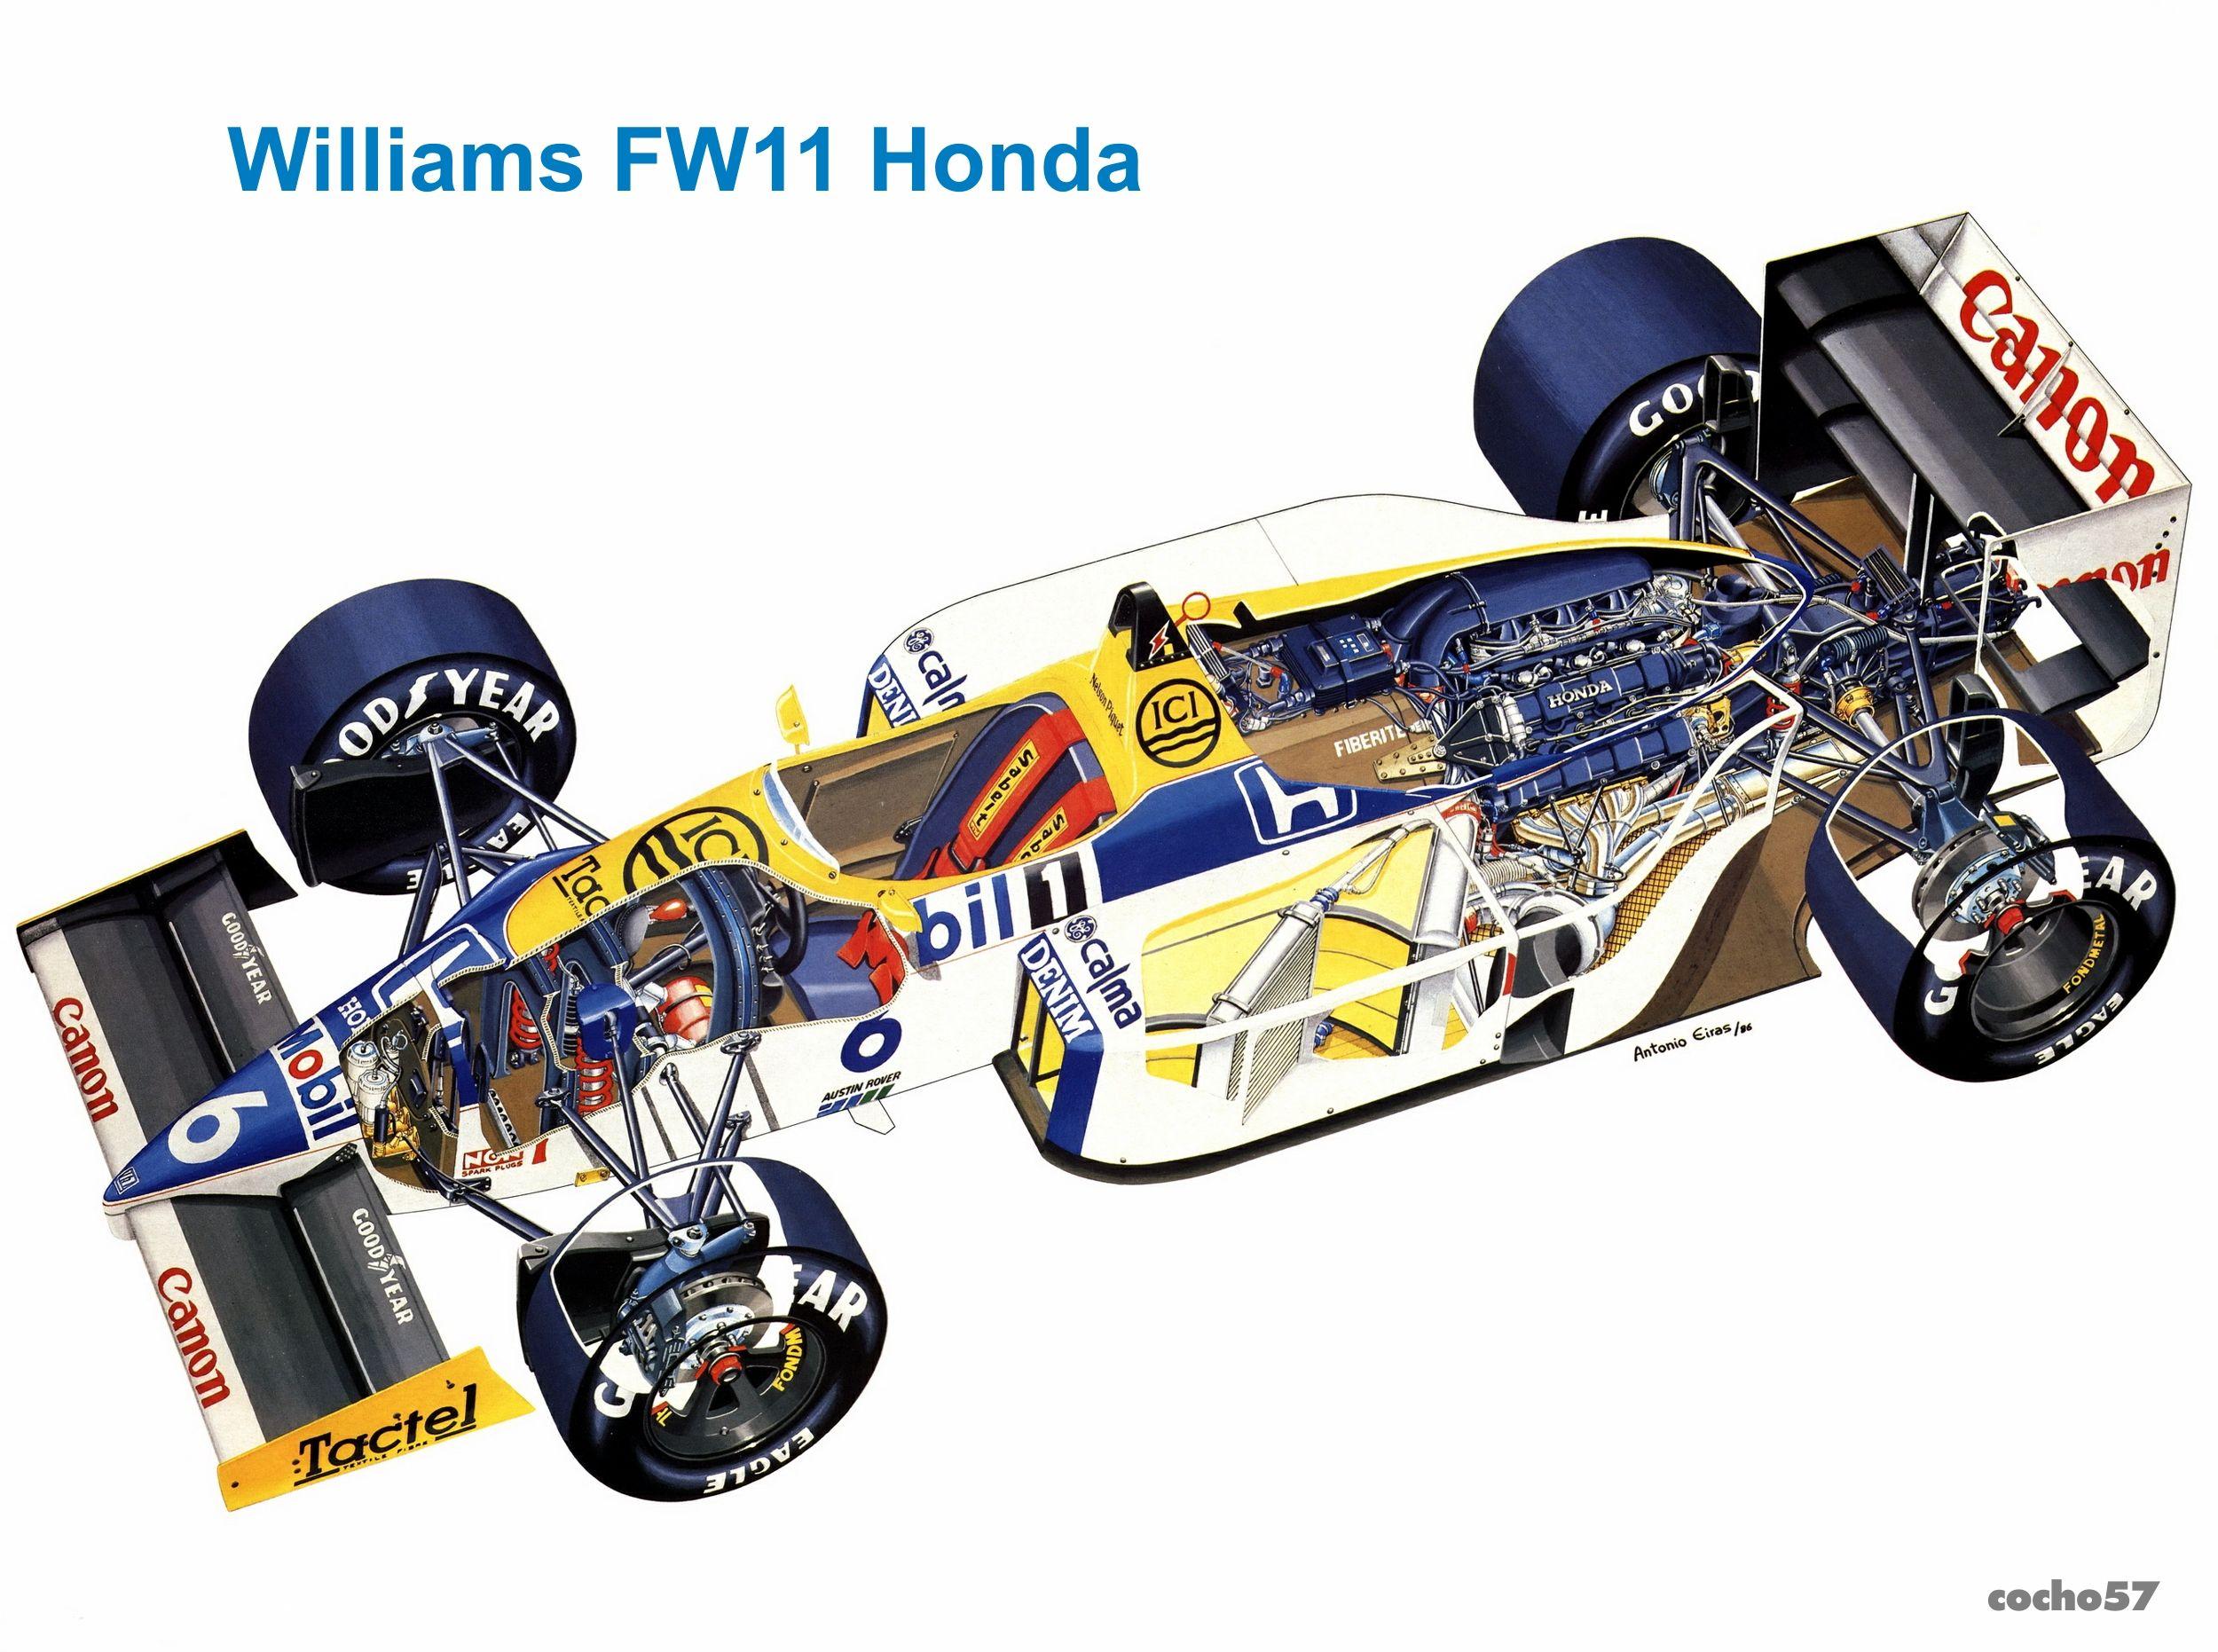 Williams FW 11 Honda 1986 Diseño Patrick Head, Sergio Rinland